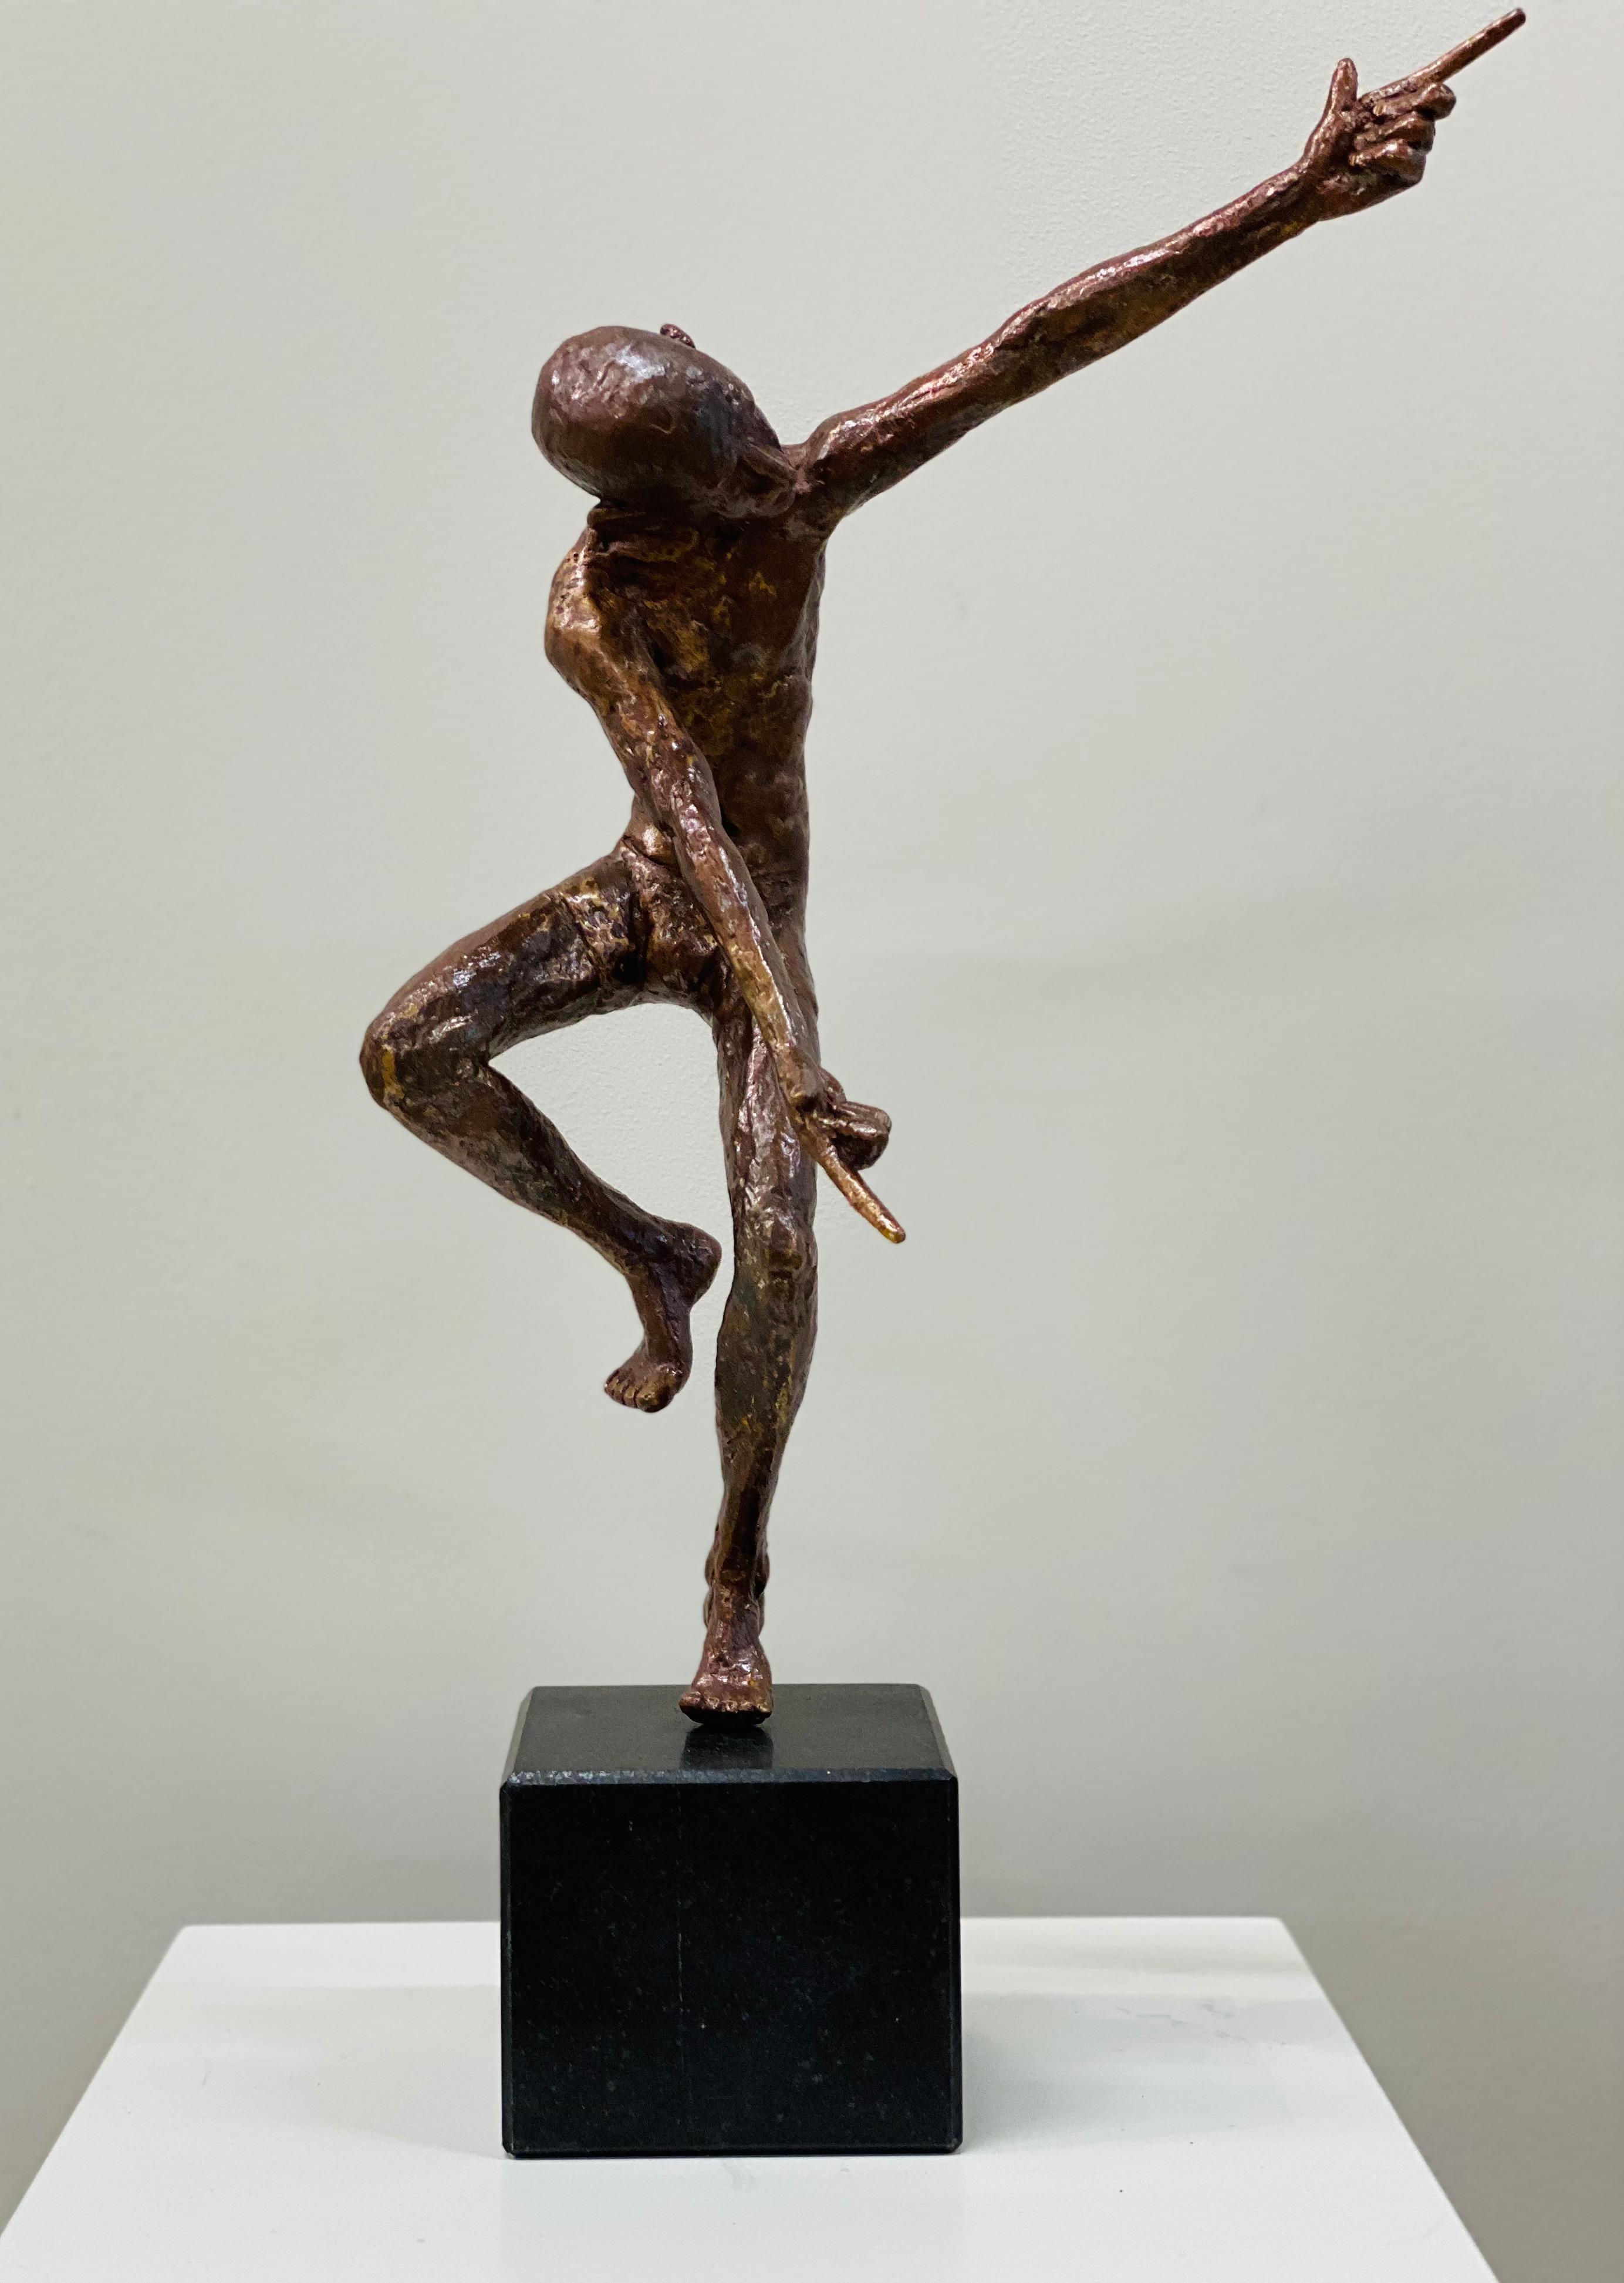 Dancer IX- 21st Century Contemporary Bronze Sculpture of a Male Nude Dancer